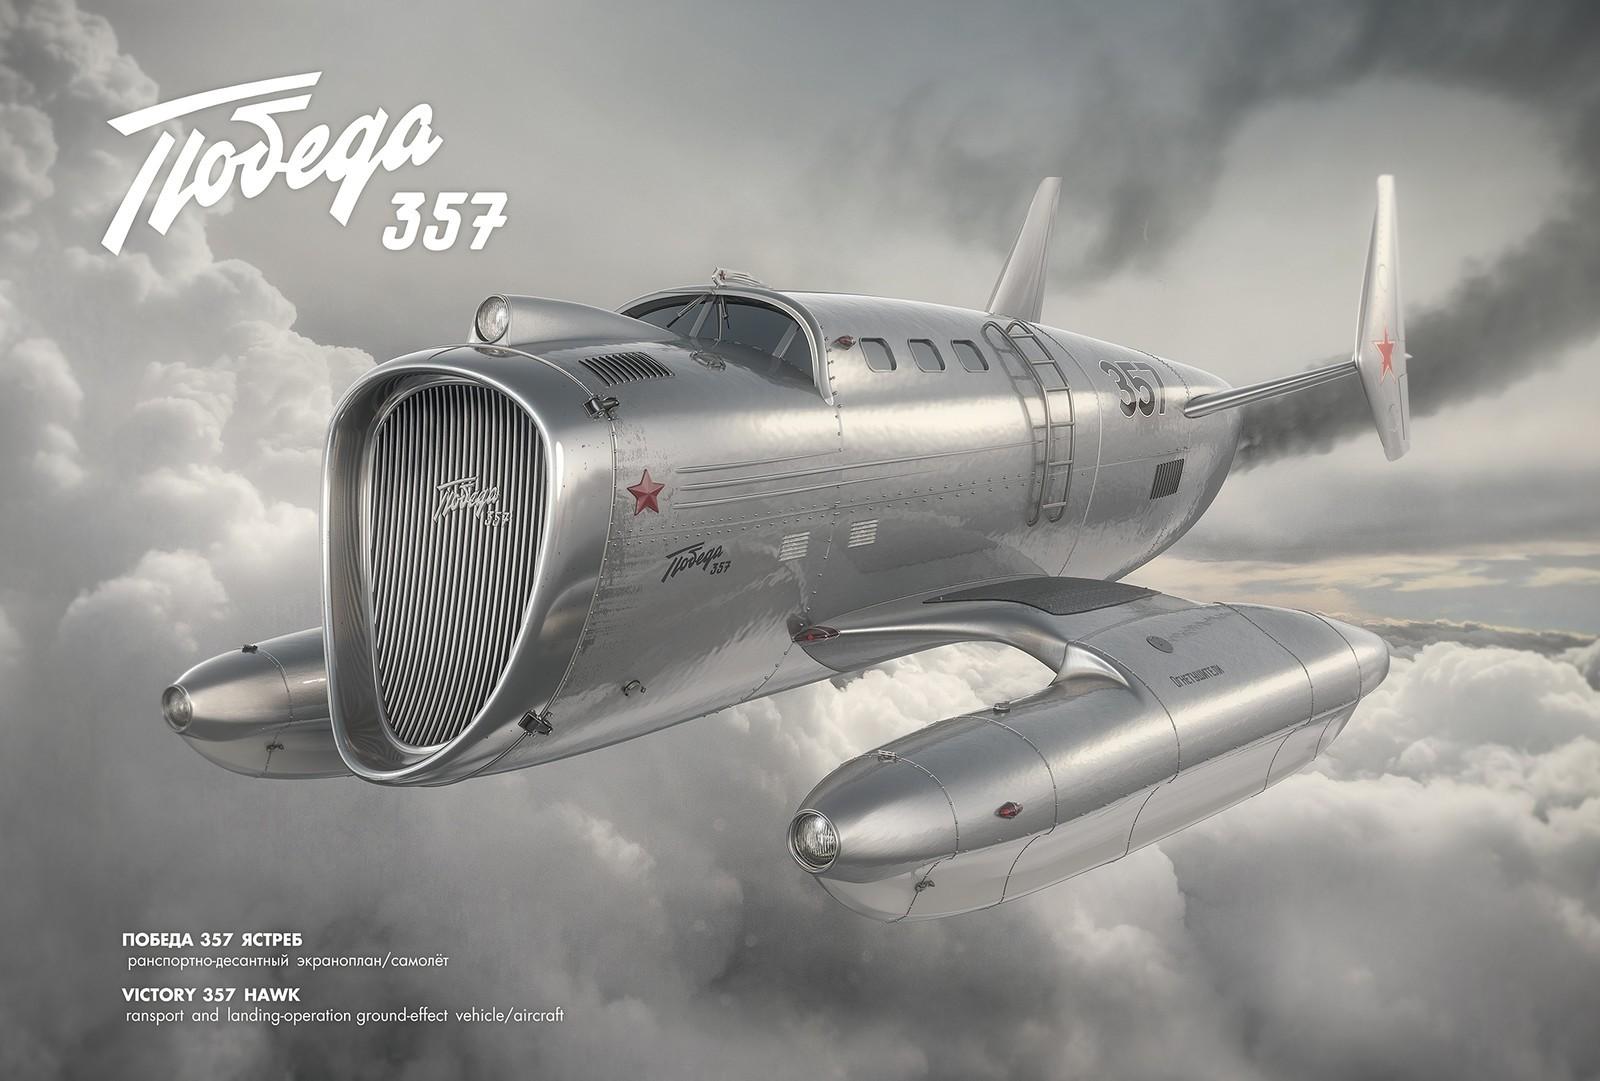 Victory 357 Hawk Ekranoplan (What-if)